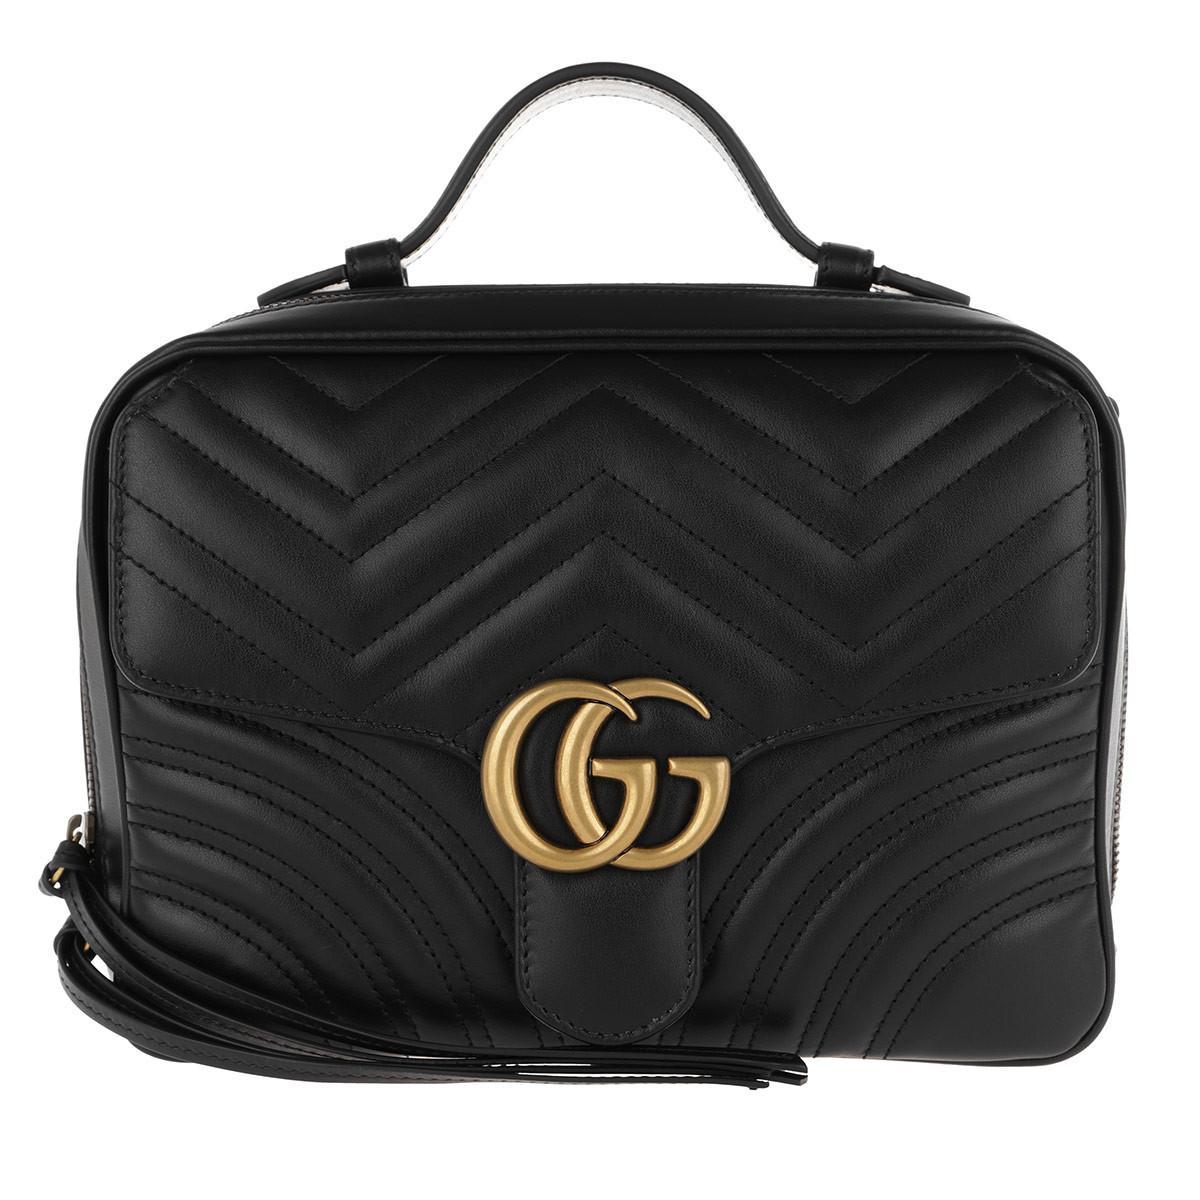 6a8aaf8c3b Gucci GG Marmont 2.0 Shoulder Bag Nero in Black - Lyst